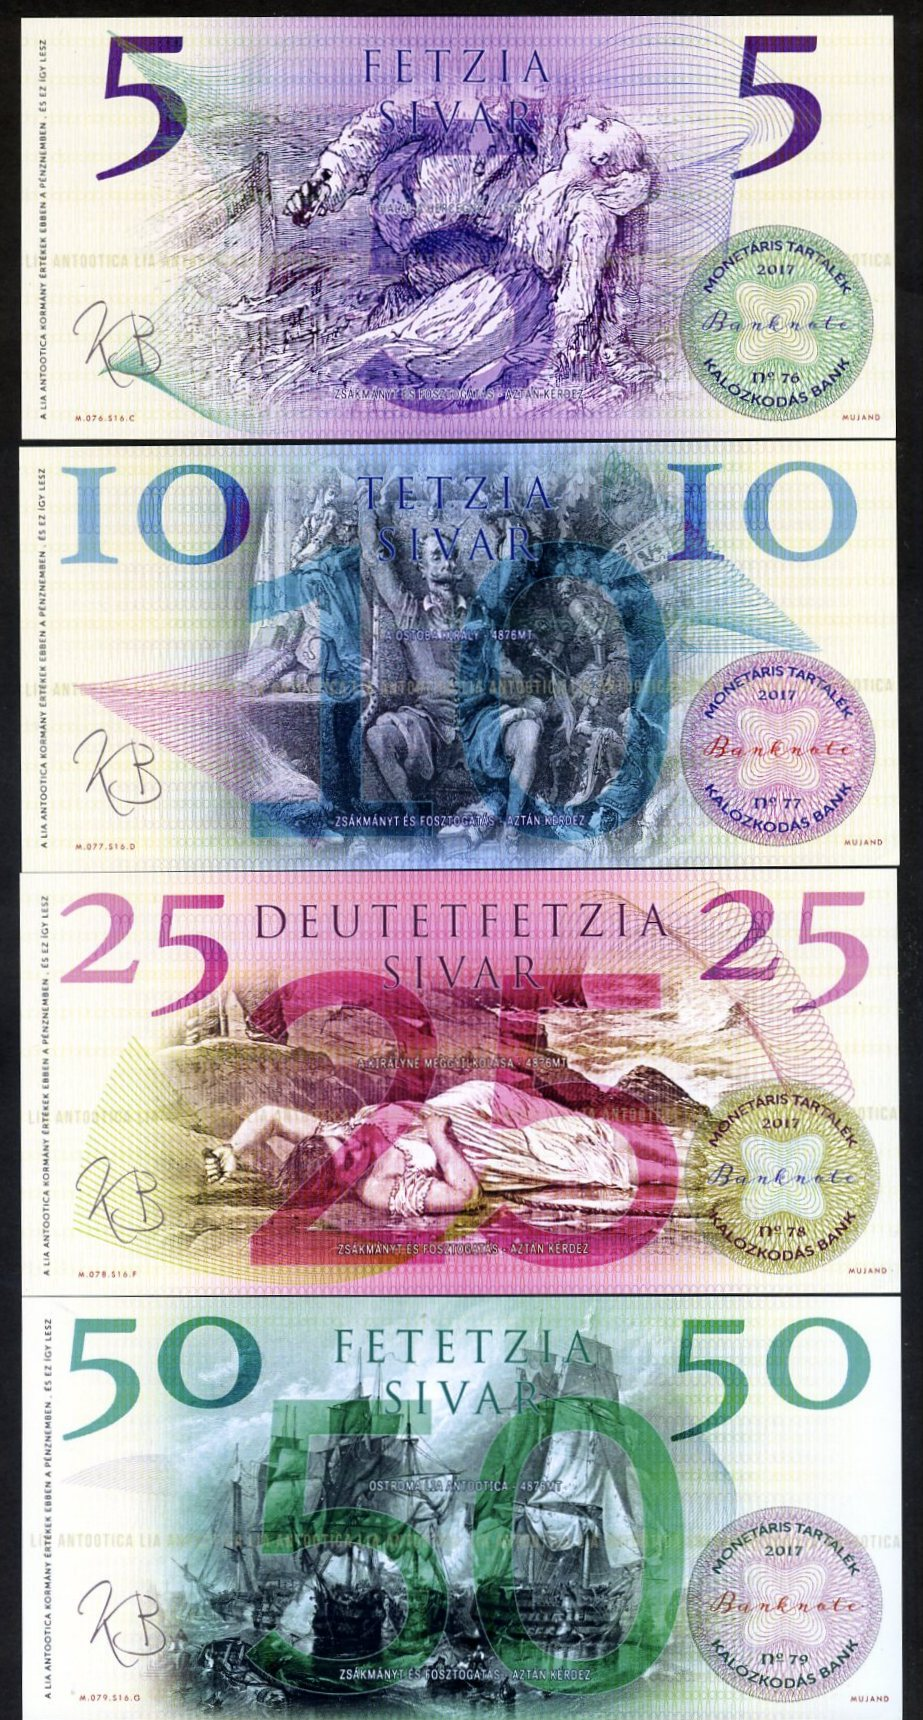 Lia Antootica 5 10 25 50 Sivar Pirate-Notes 2017 UNC Polymer Lemberg-Zp